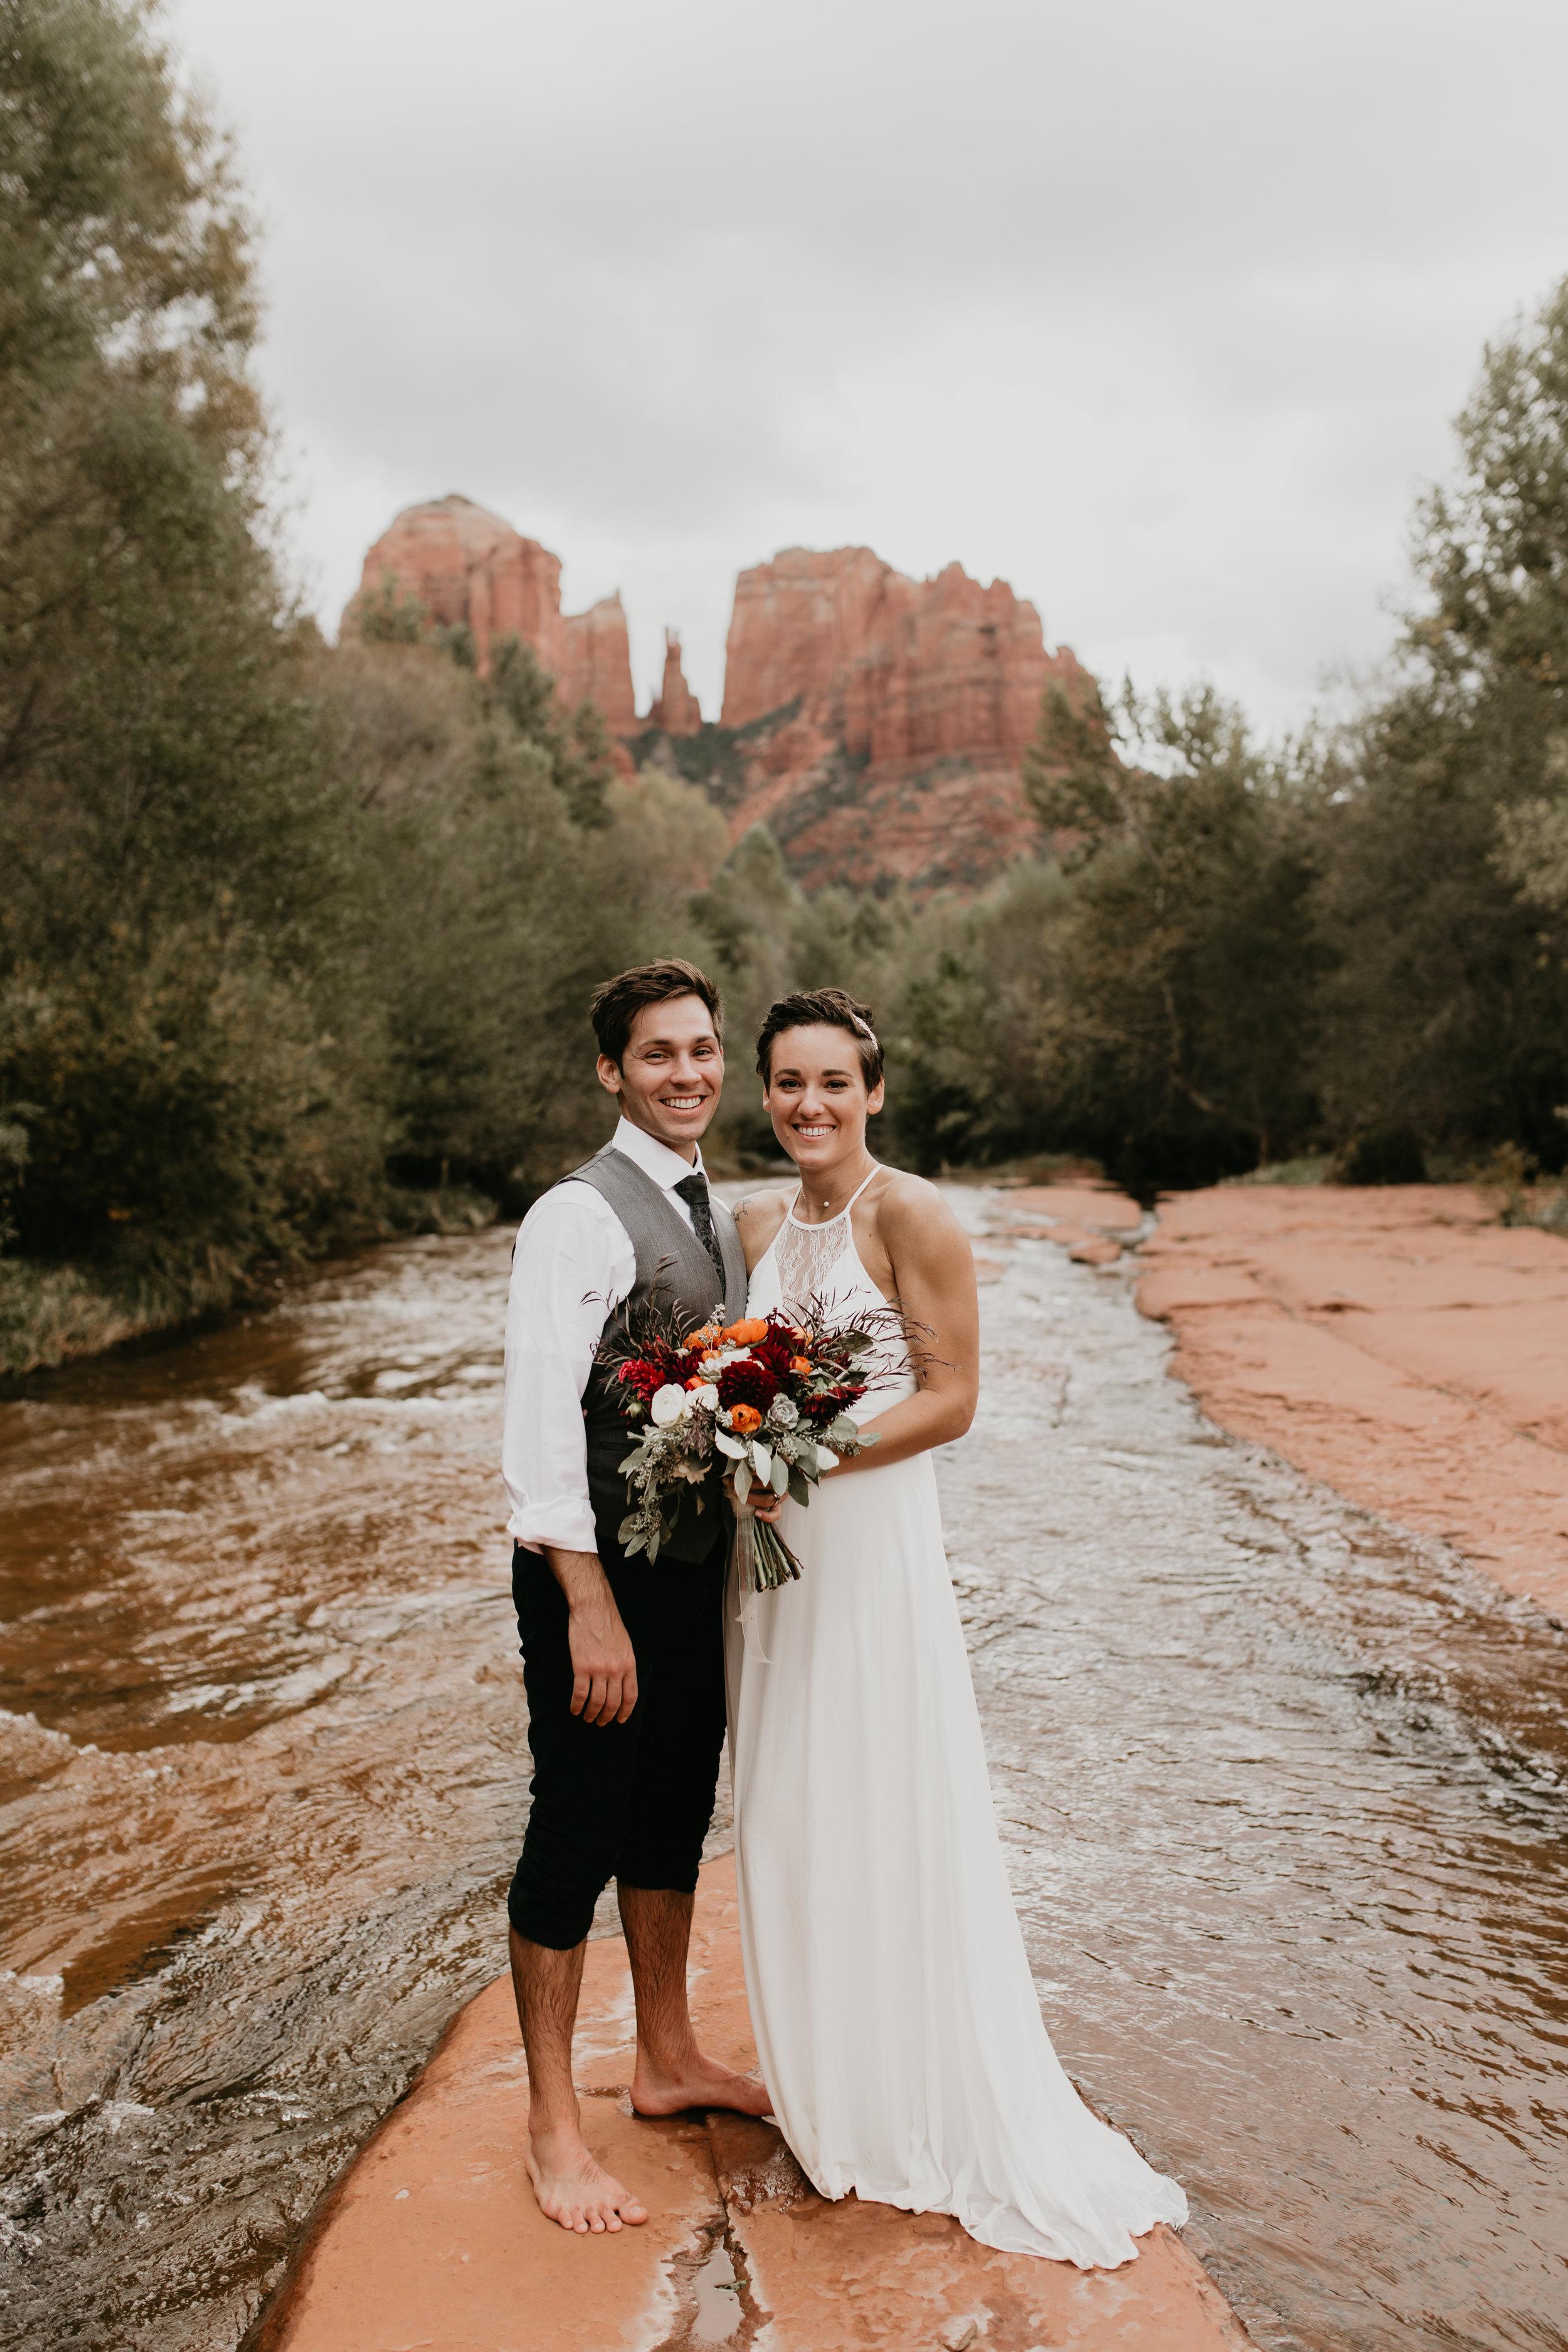 nicole-daacke-photography-sedona-arizona-destination-elopement-wedding-photographer-catherdral-rock-hiking-elopement-sedona-river-elopement-photos-desert-rock-wedding-photographer-laid-back-spontaneous-elopement-114.jpg